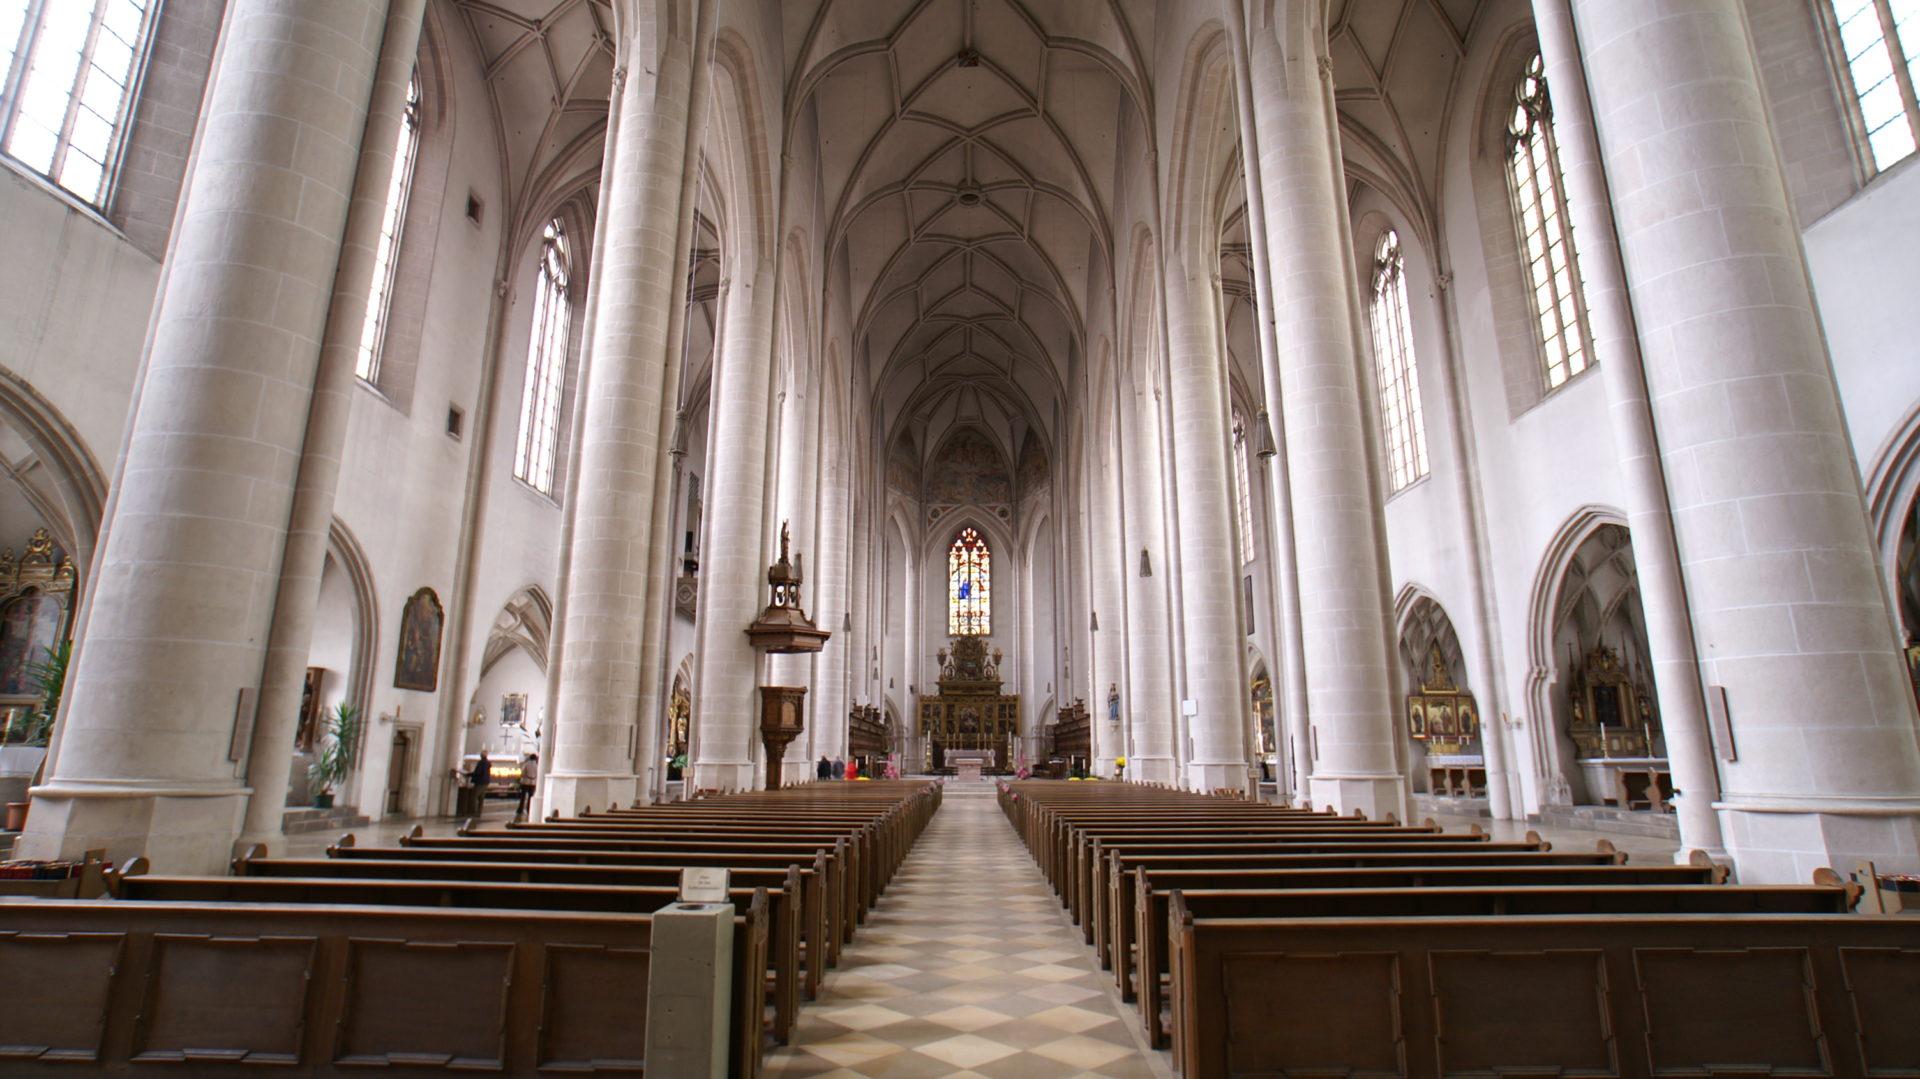 Liebfrauenmünster und St. Moritz Ingolstadt | muenster-ingolstadt.de